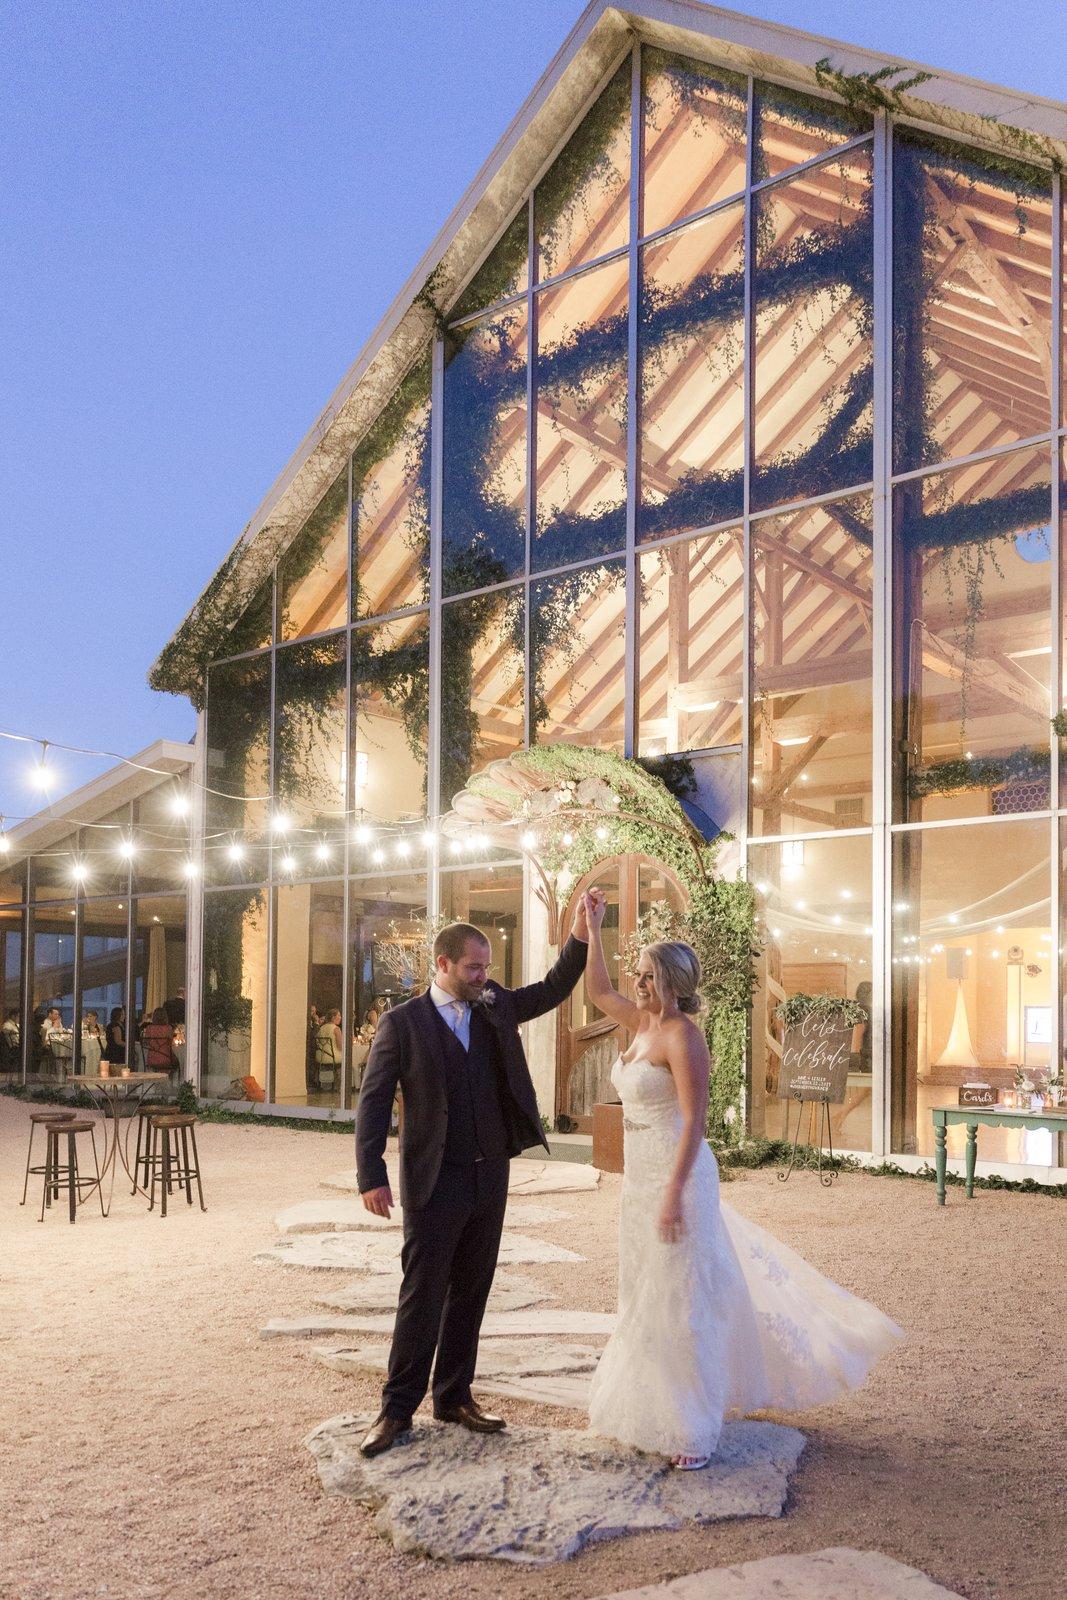 The Barr Mansion and Ballroom, Austin, Texas